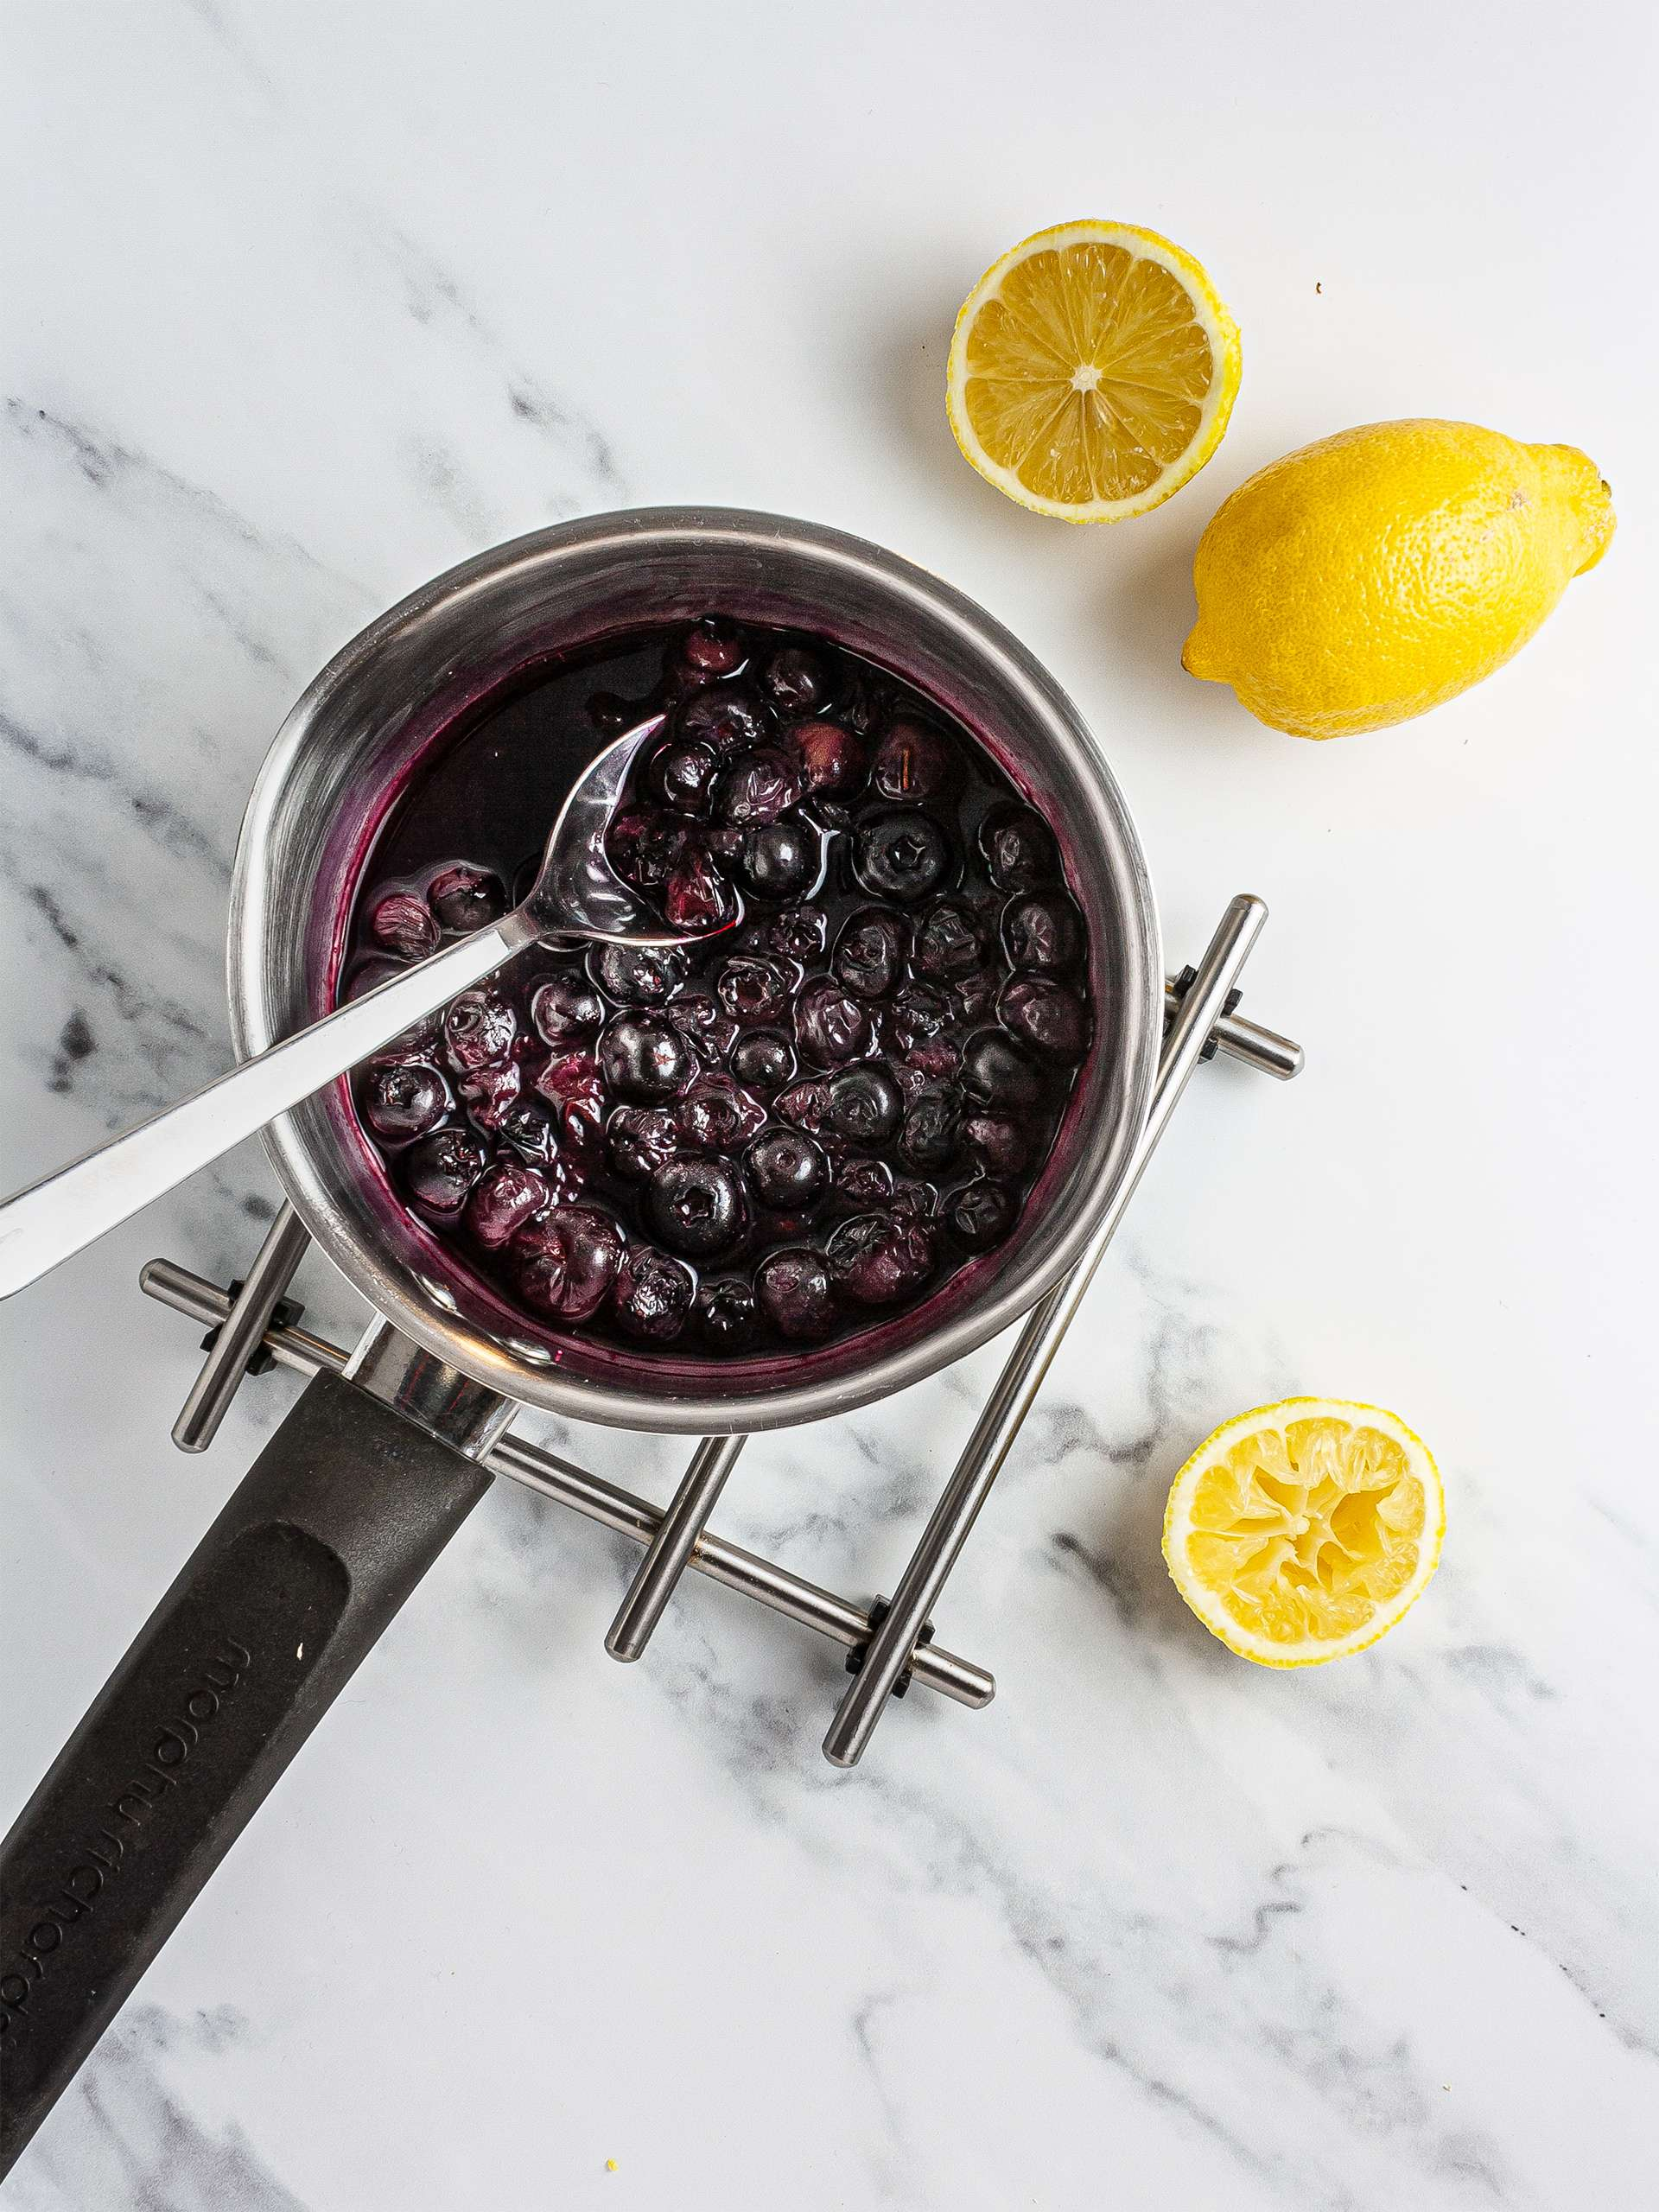 Lemon blueberry compote